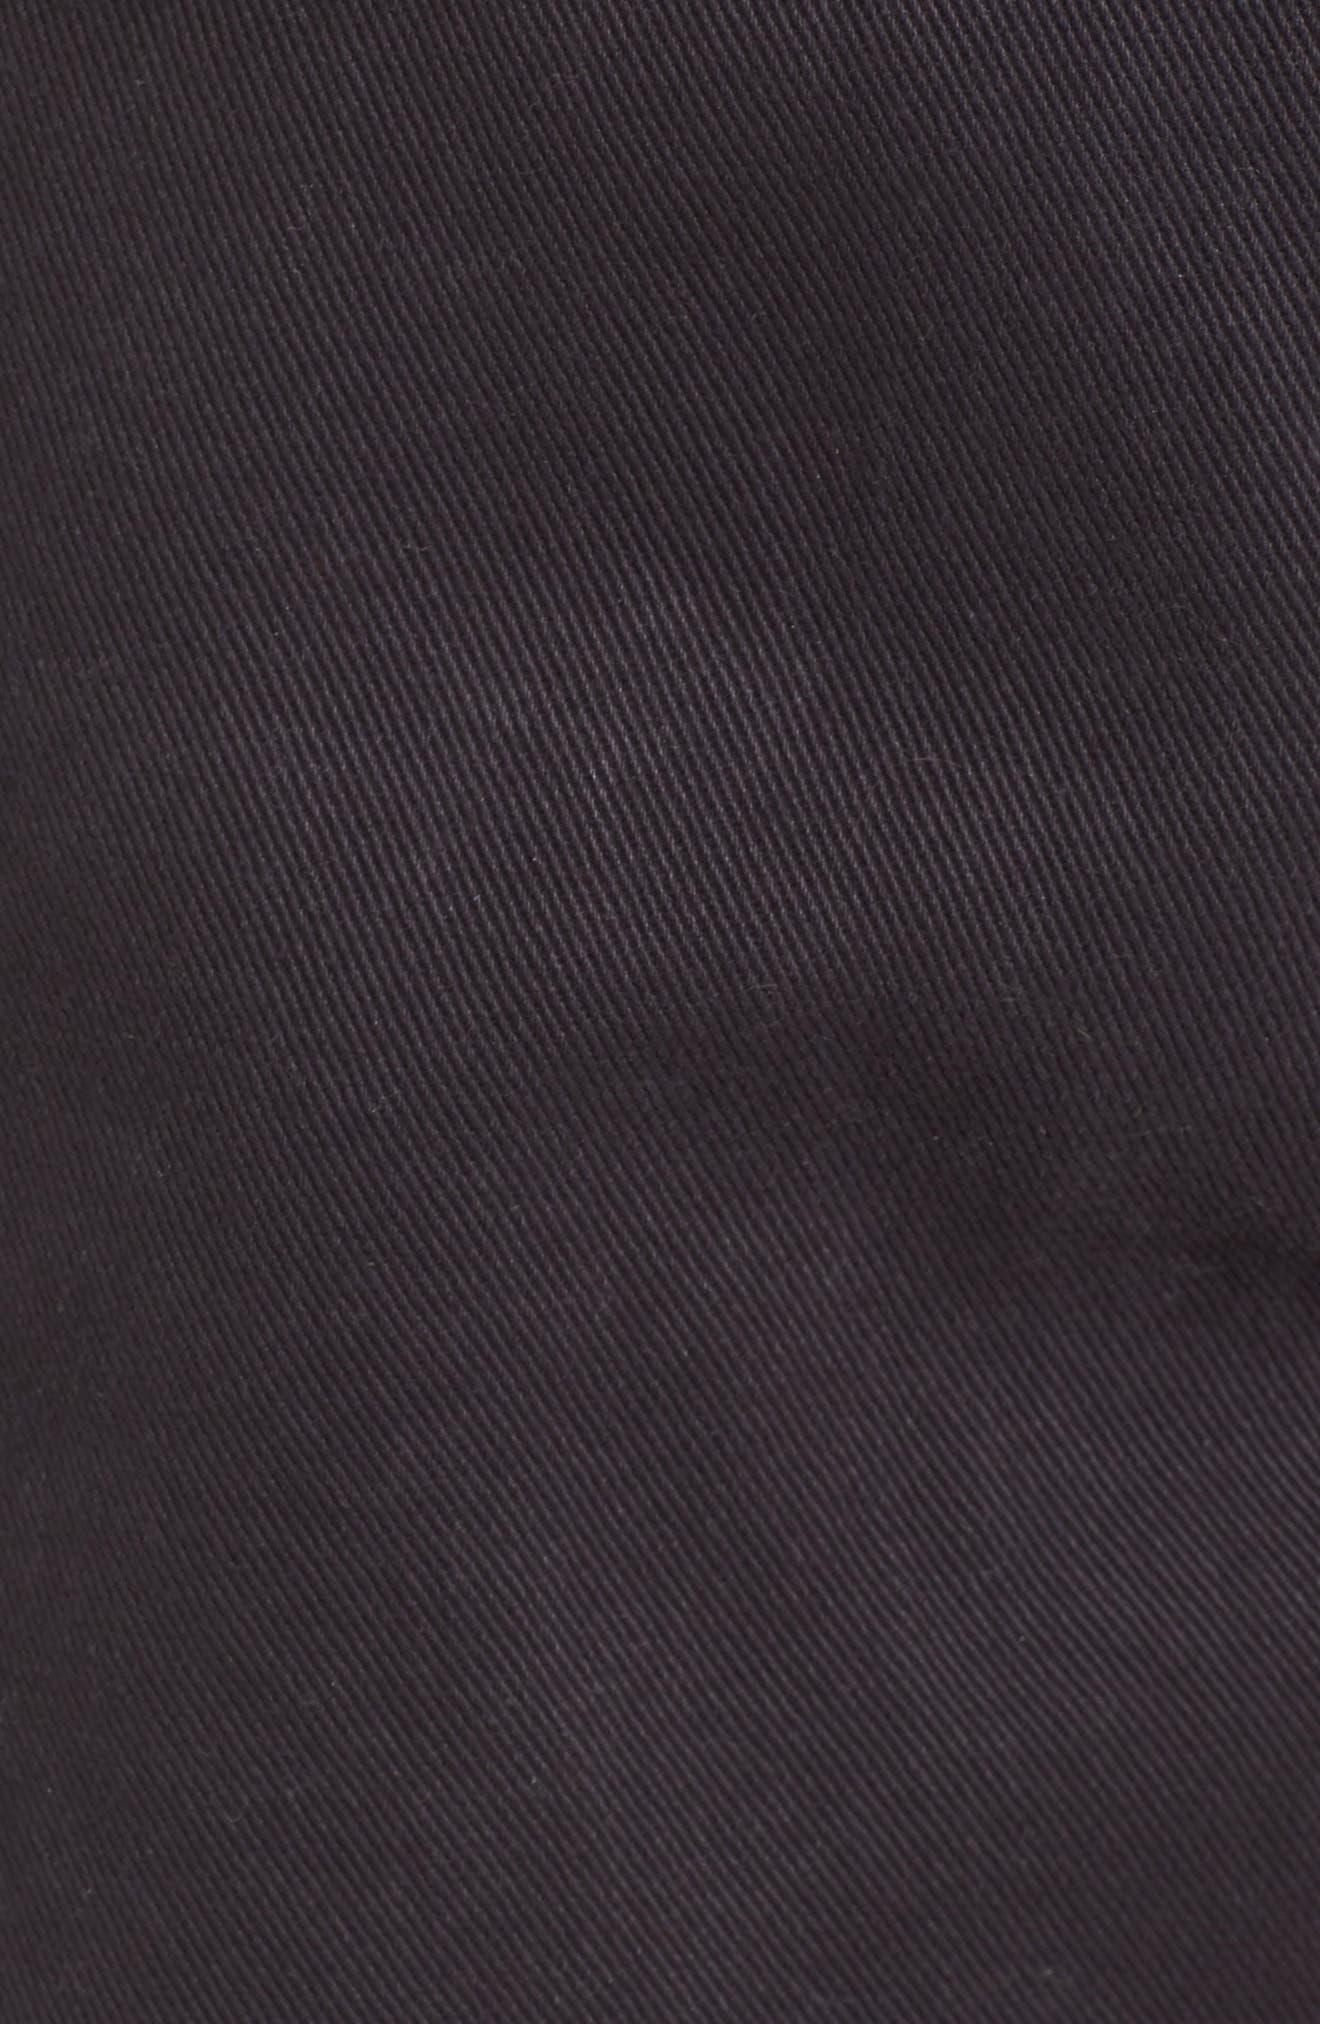 LOVE LIKE SUMMER X BILLABONG,                             Denim Shorts,                             Alternate thumbnail 5, color,                             001